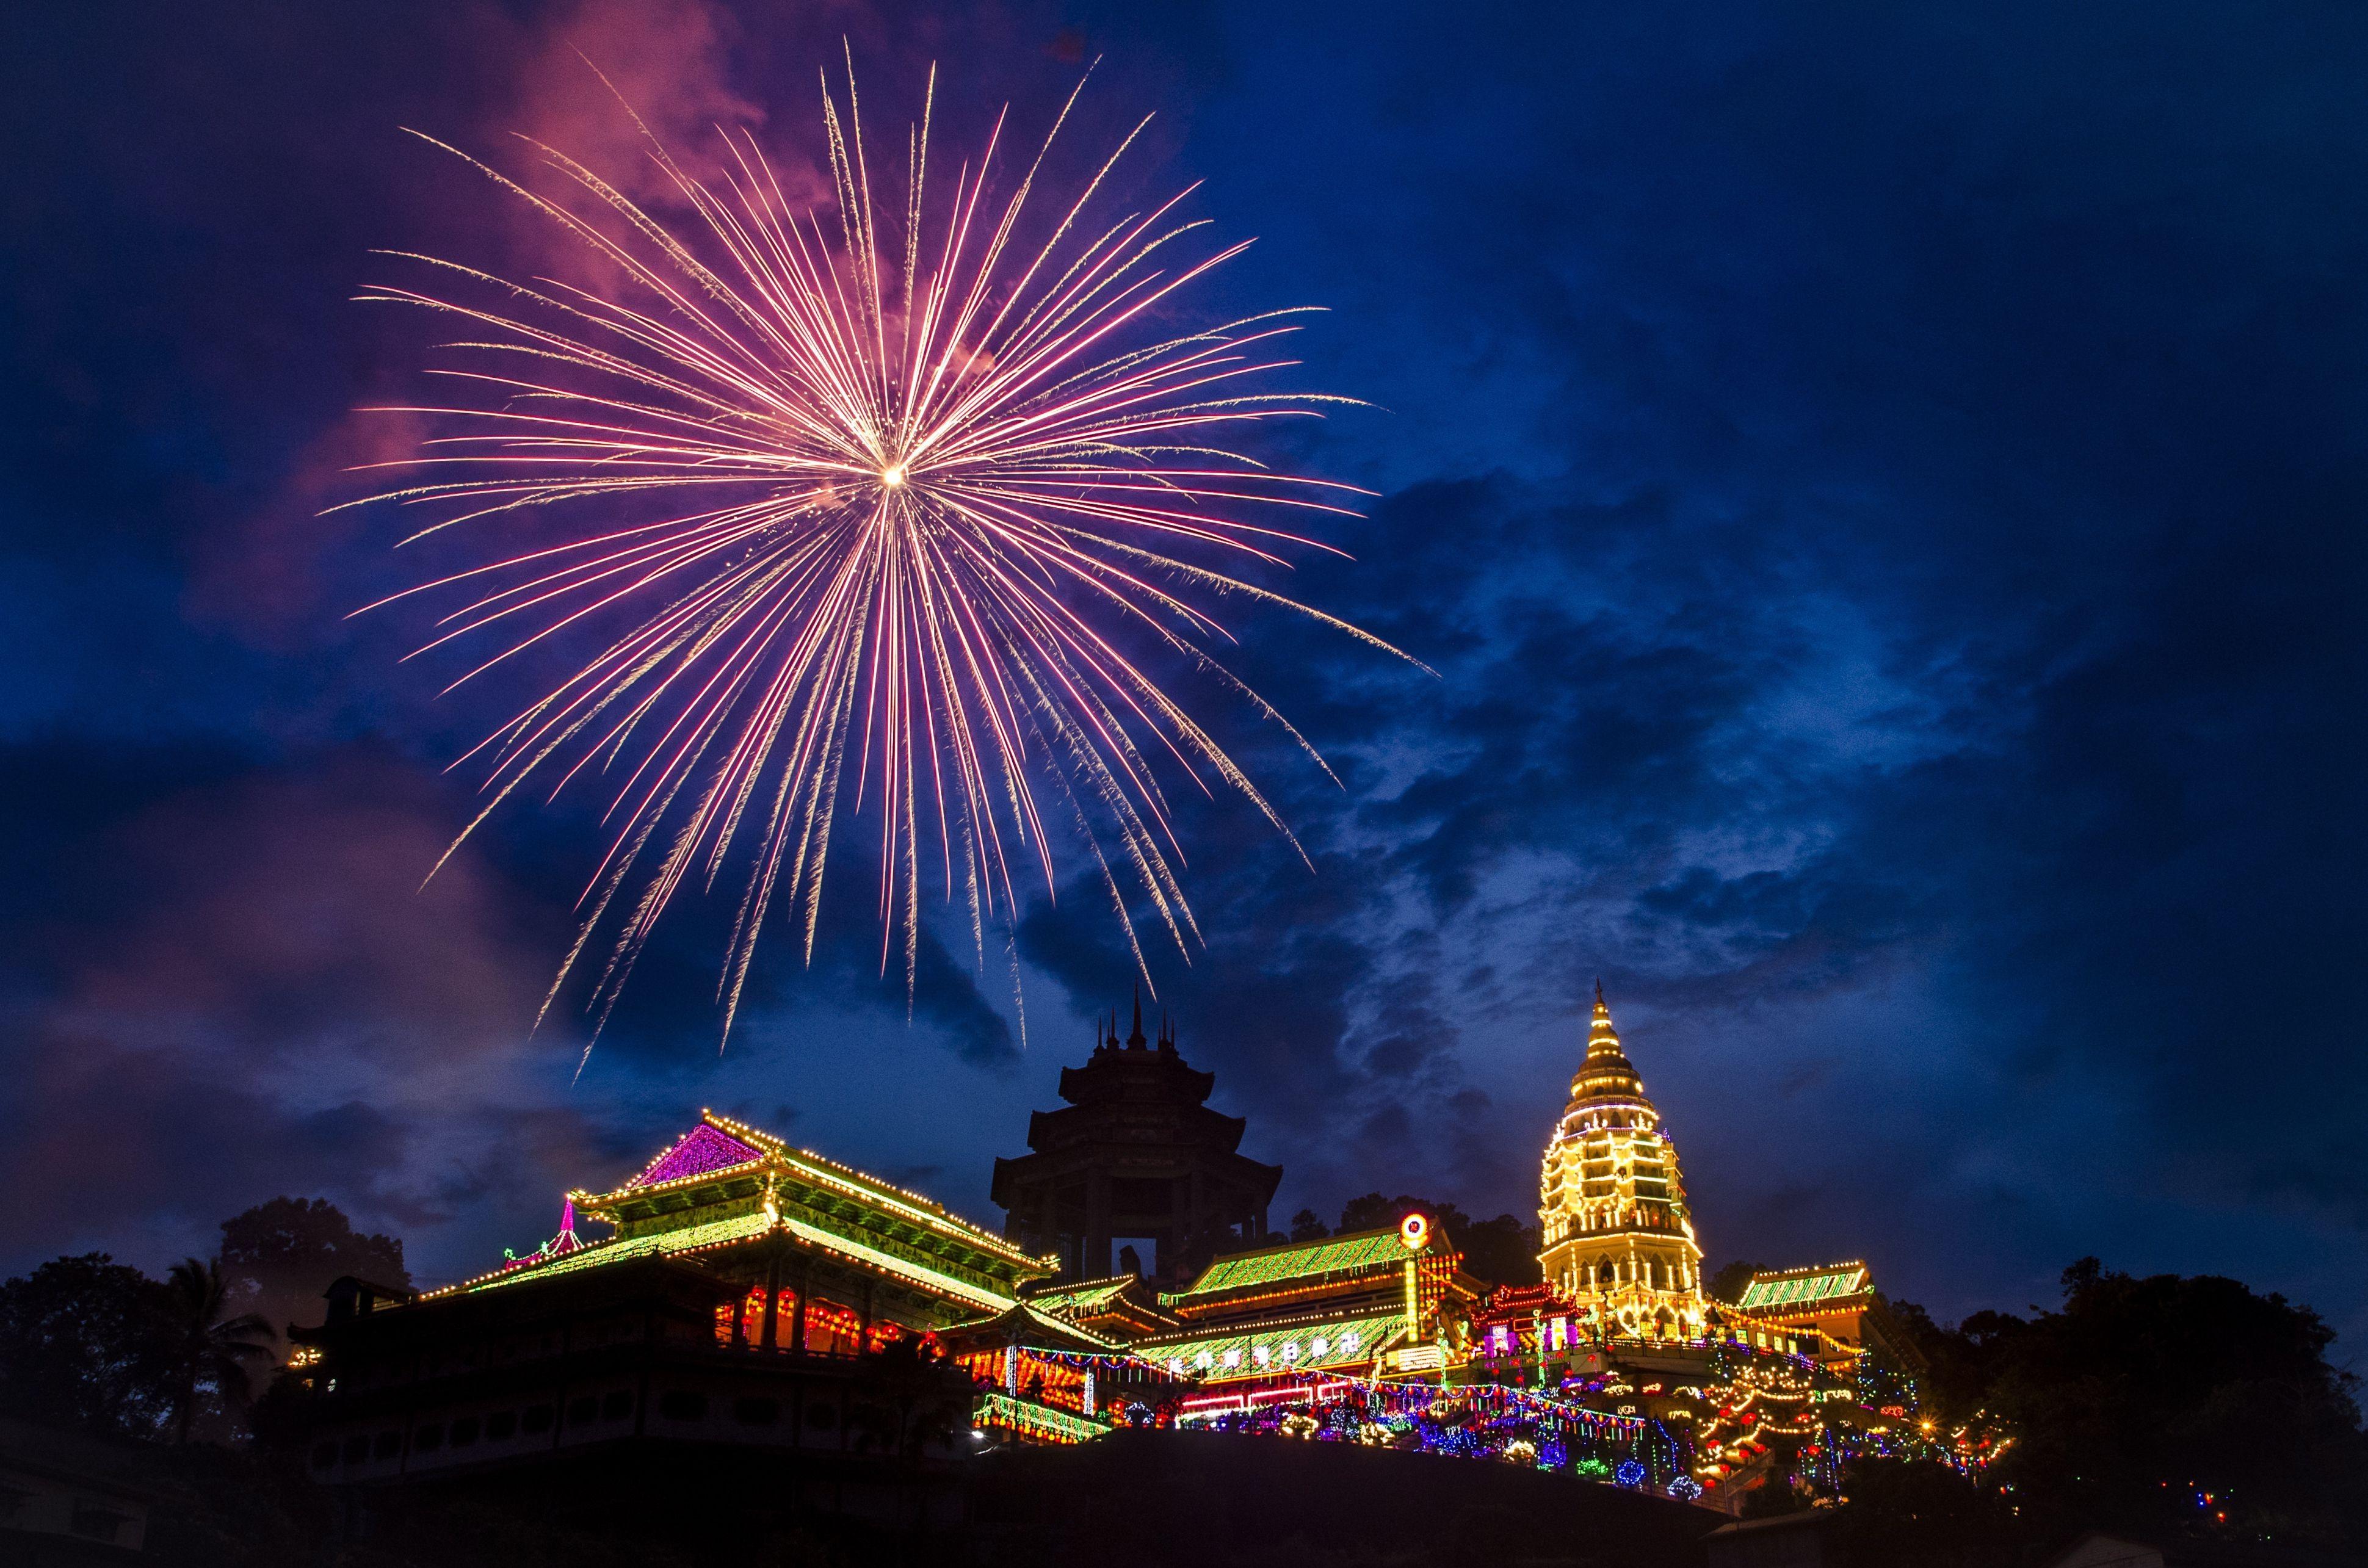 2019 March Calendar Malaysia Más Recientemente Liberado Buddhist Holidays 2018–2019 Illustrated Calendar Of 2019 March Calendar Malaysia Más Actual 2019 softail Motorcycles